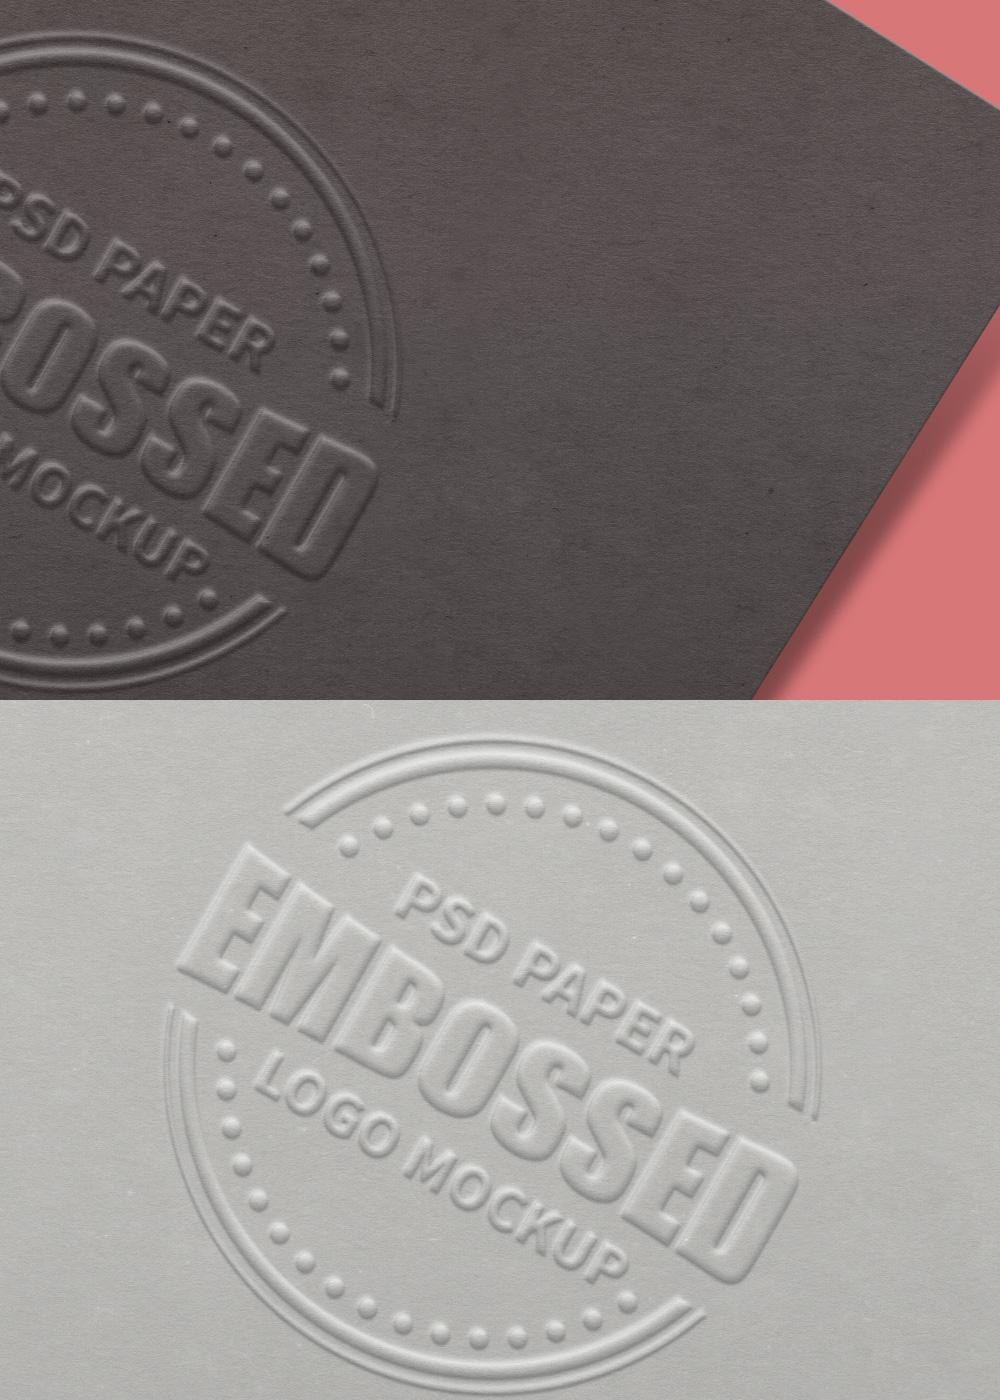 embossed-paper-logo-mockup-full-view